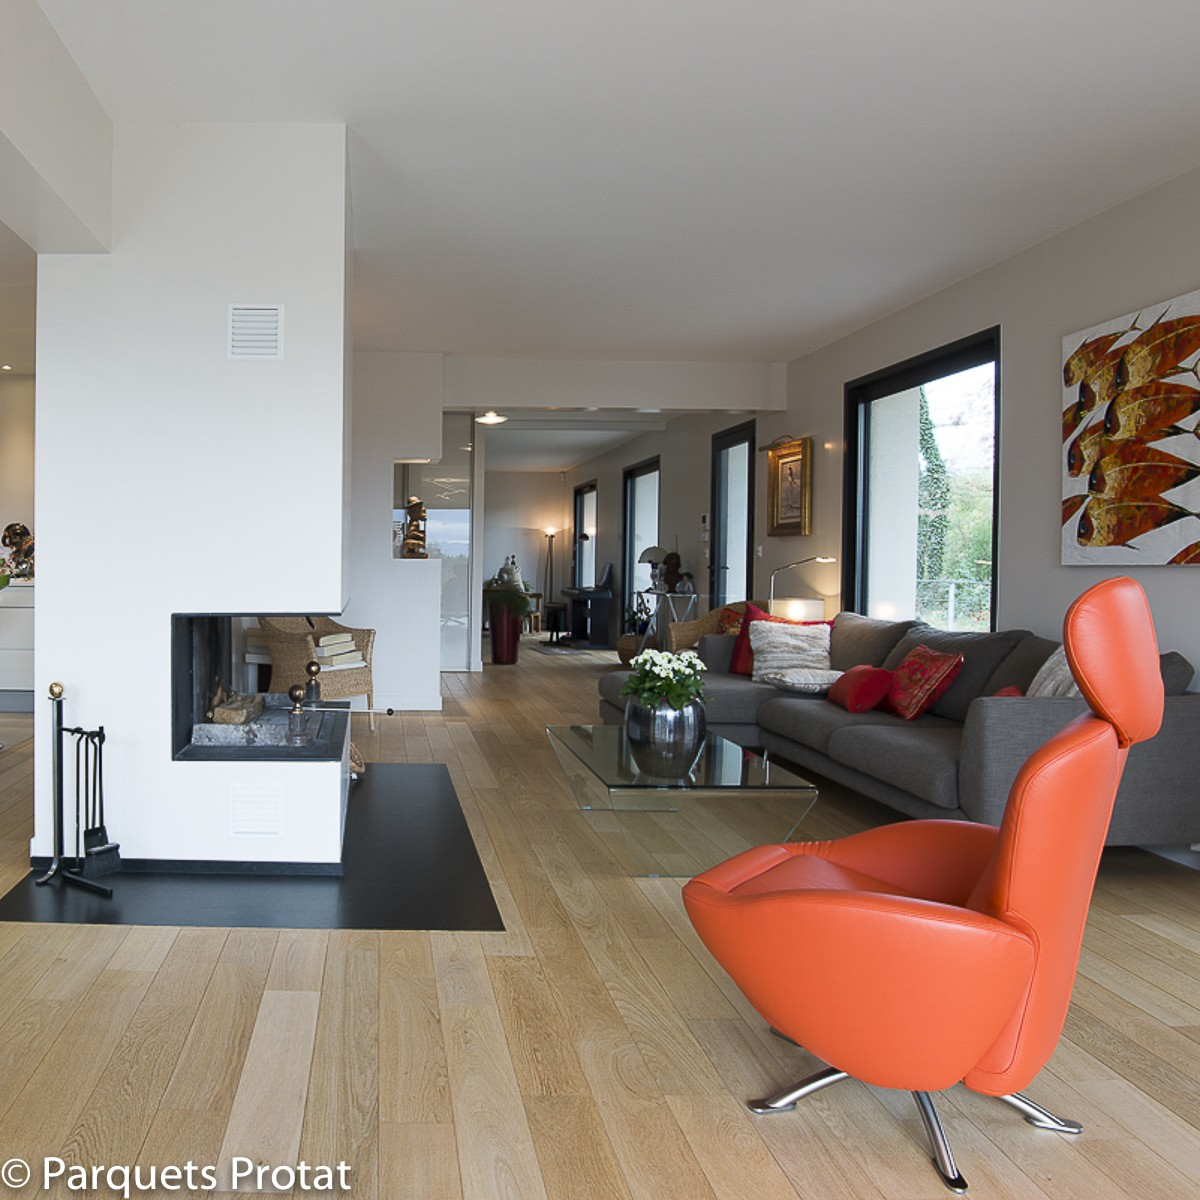 huile invisible pour parquets. Black Bedroom Furniture Sets. Home Design Ideas